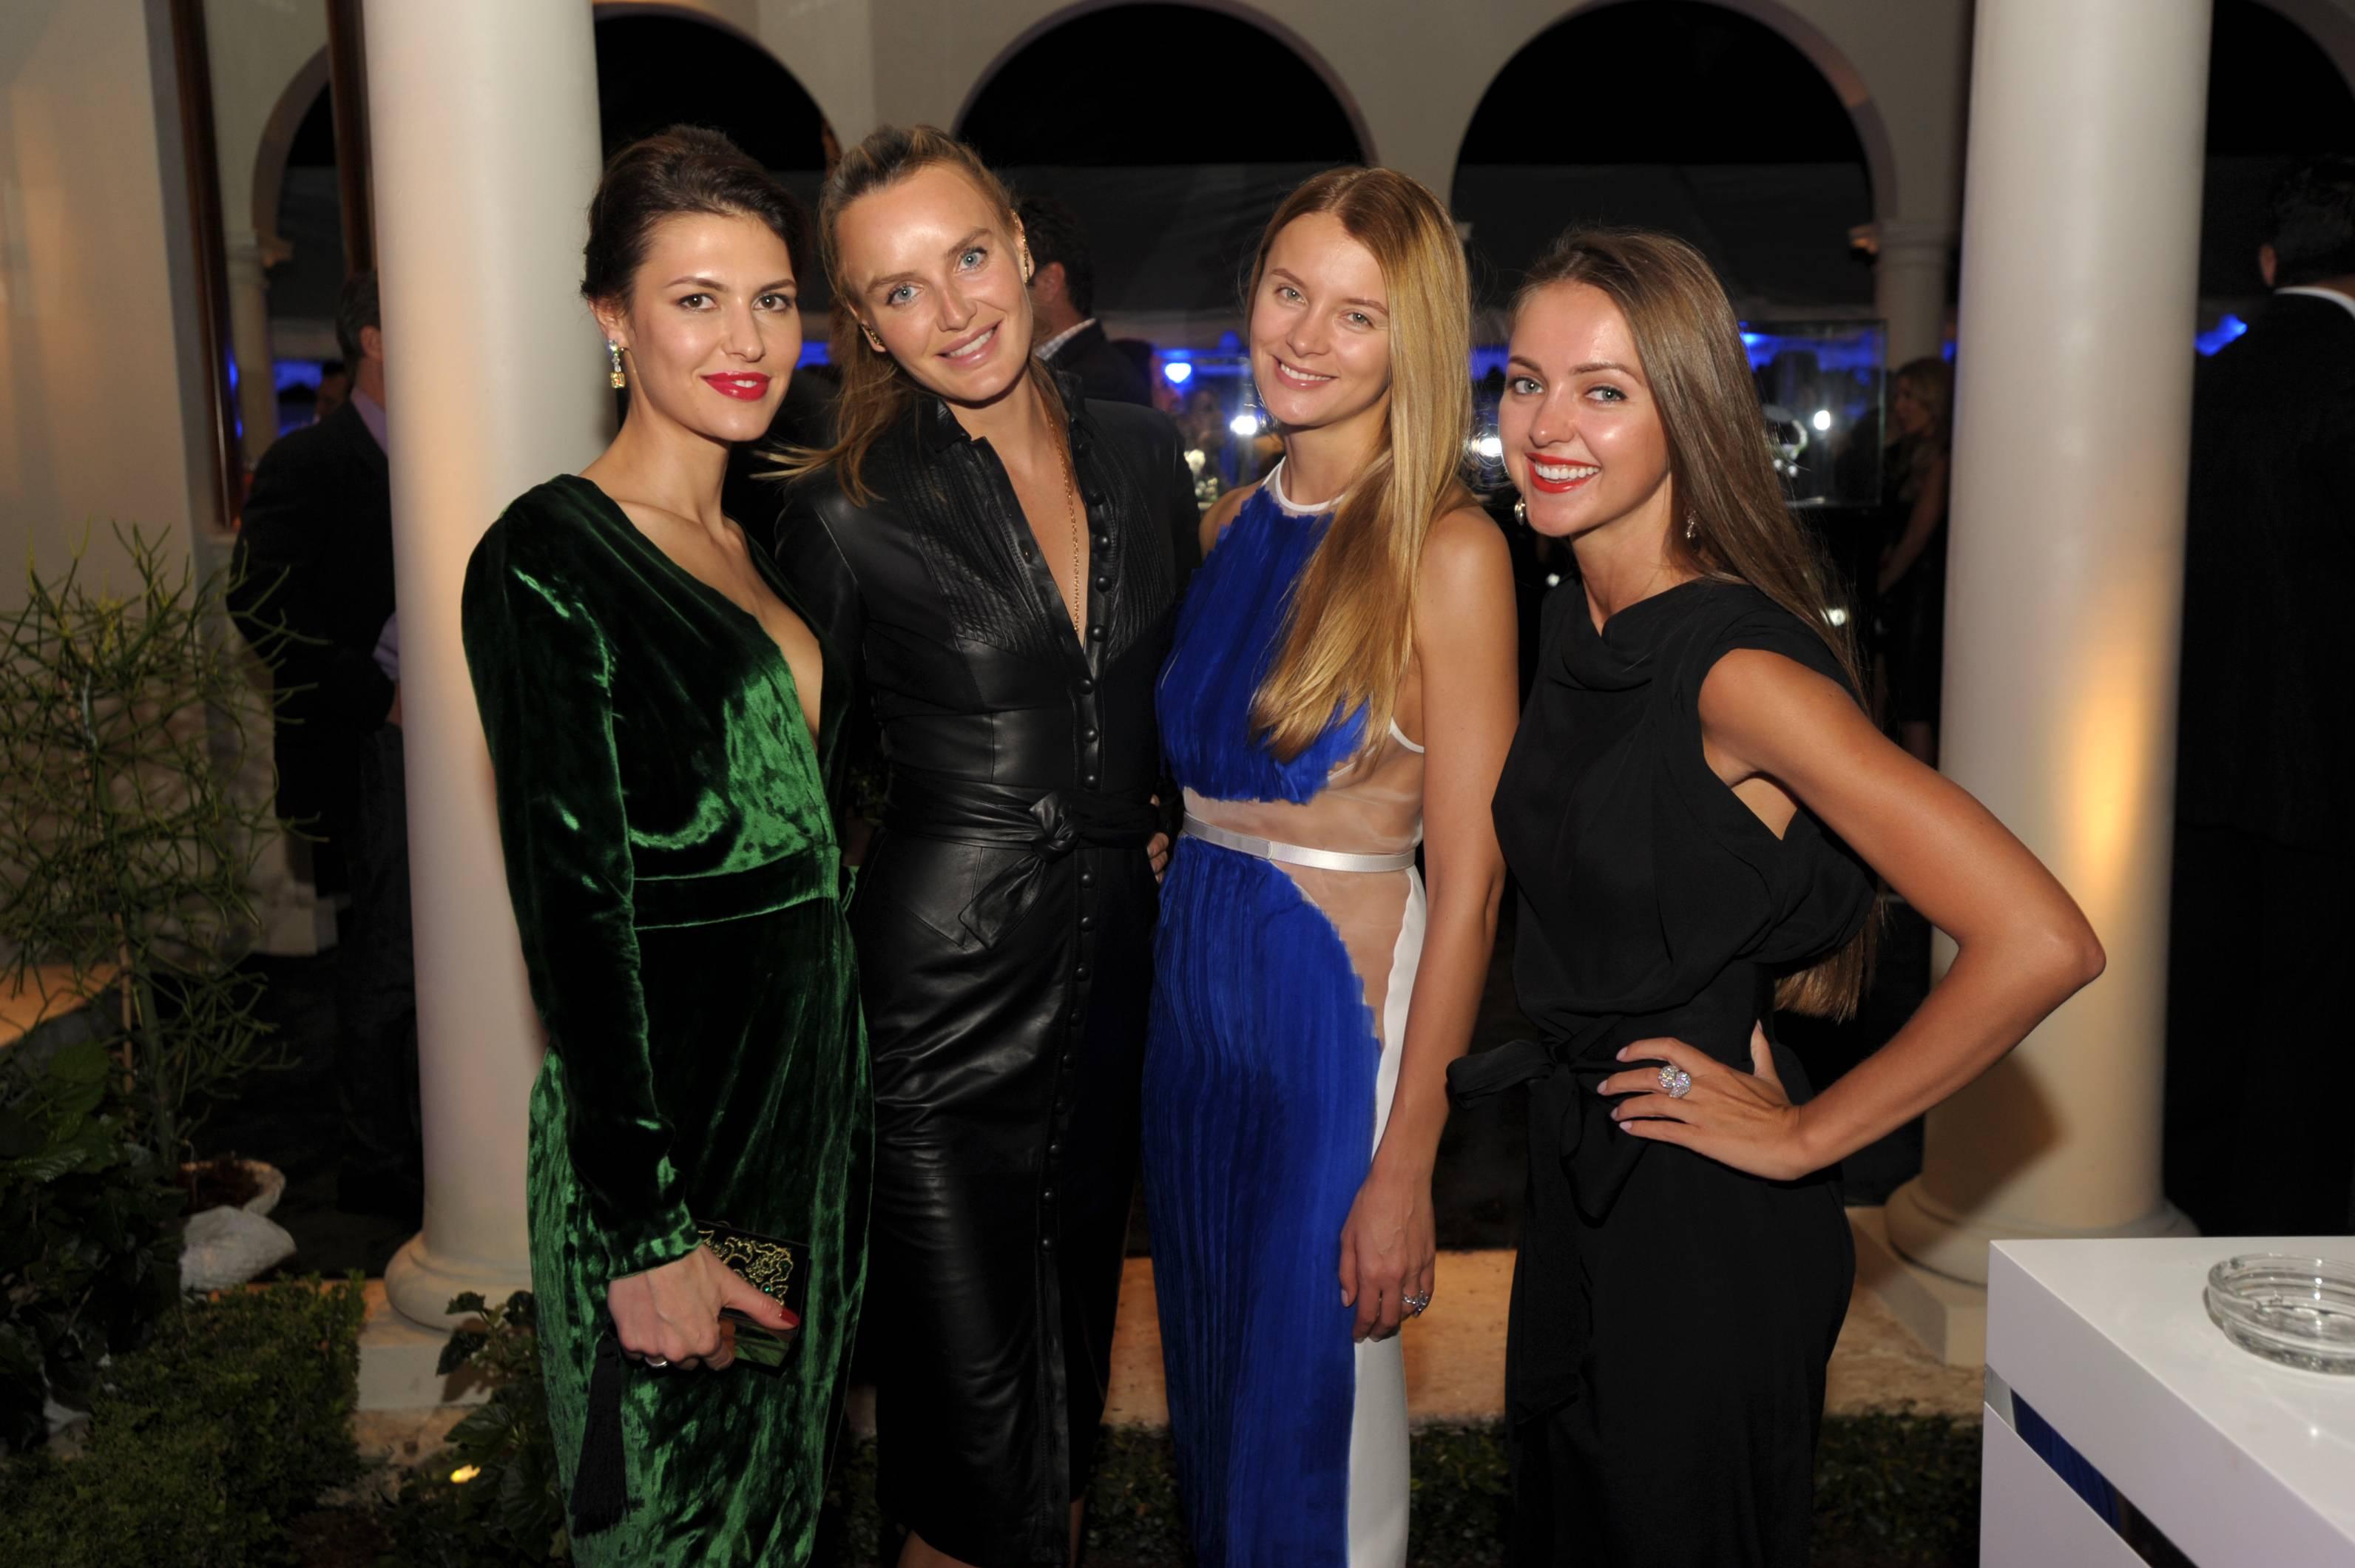 Finsky Vlada, Masha Hanson, Elena Baykova, & Irina Artemova